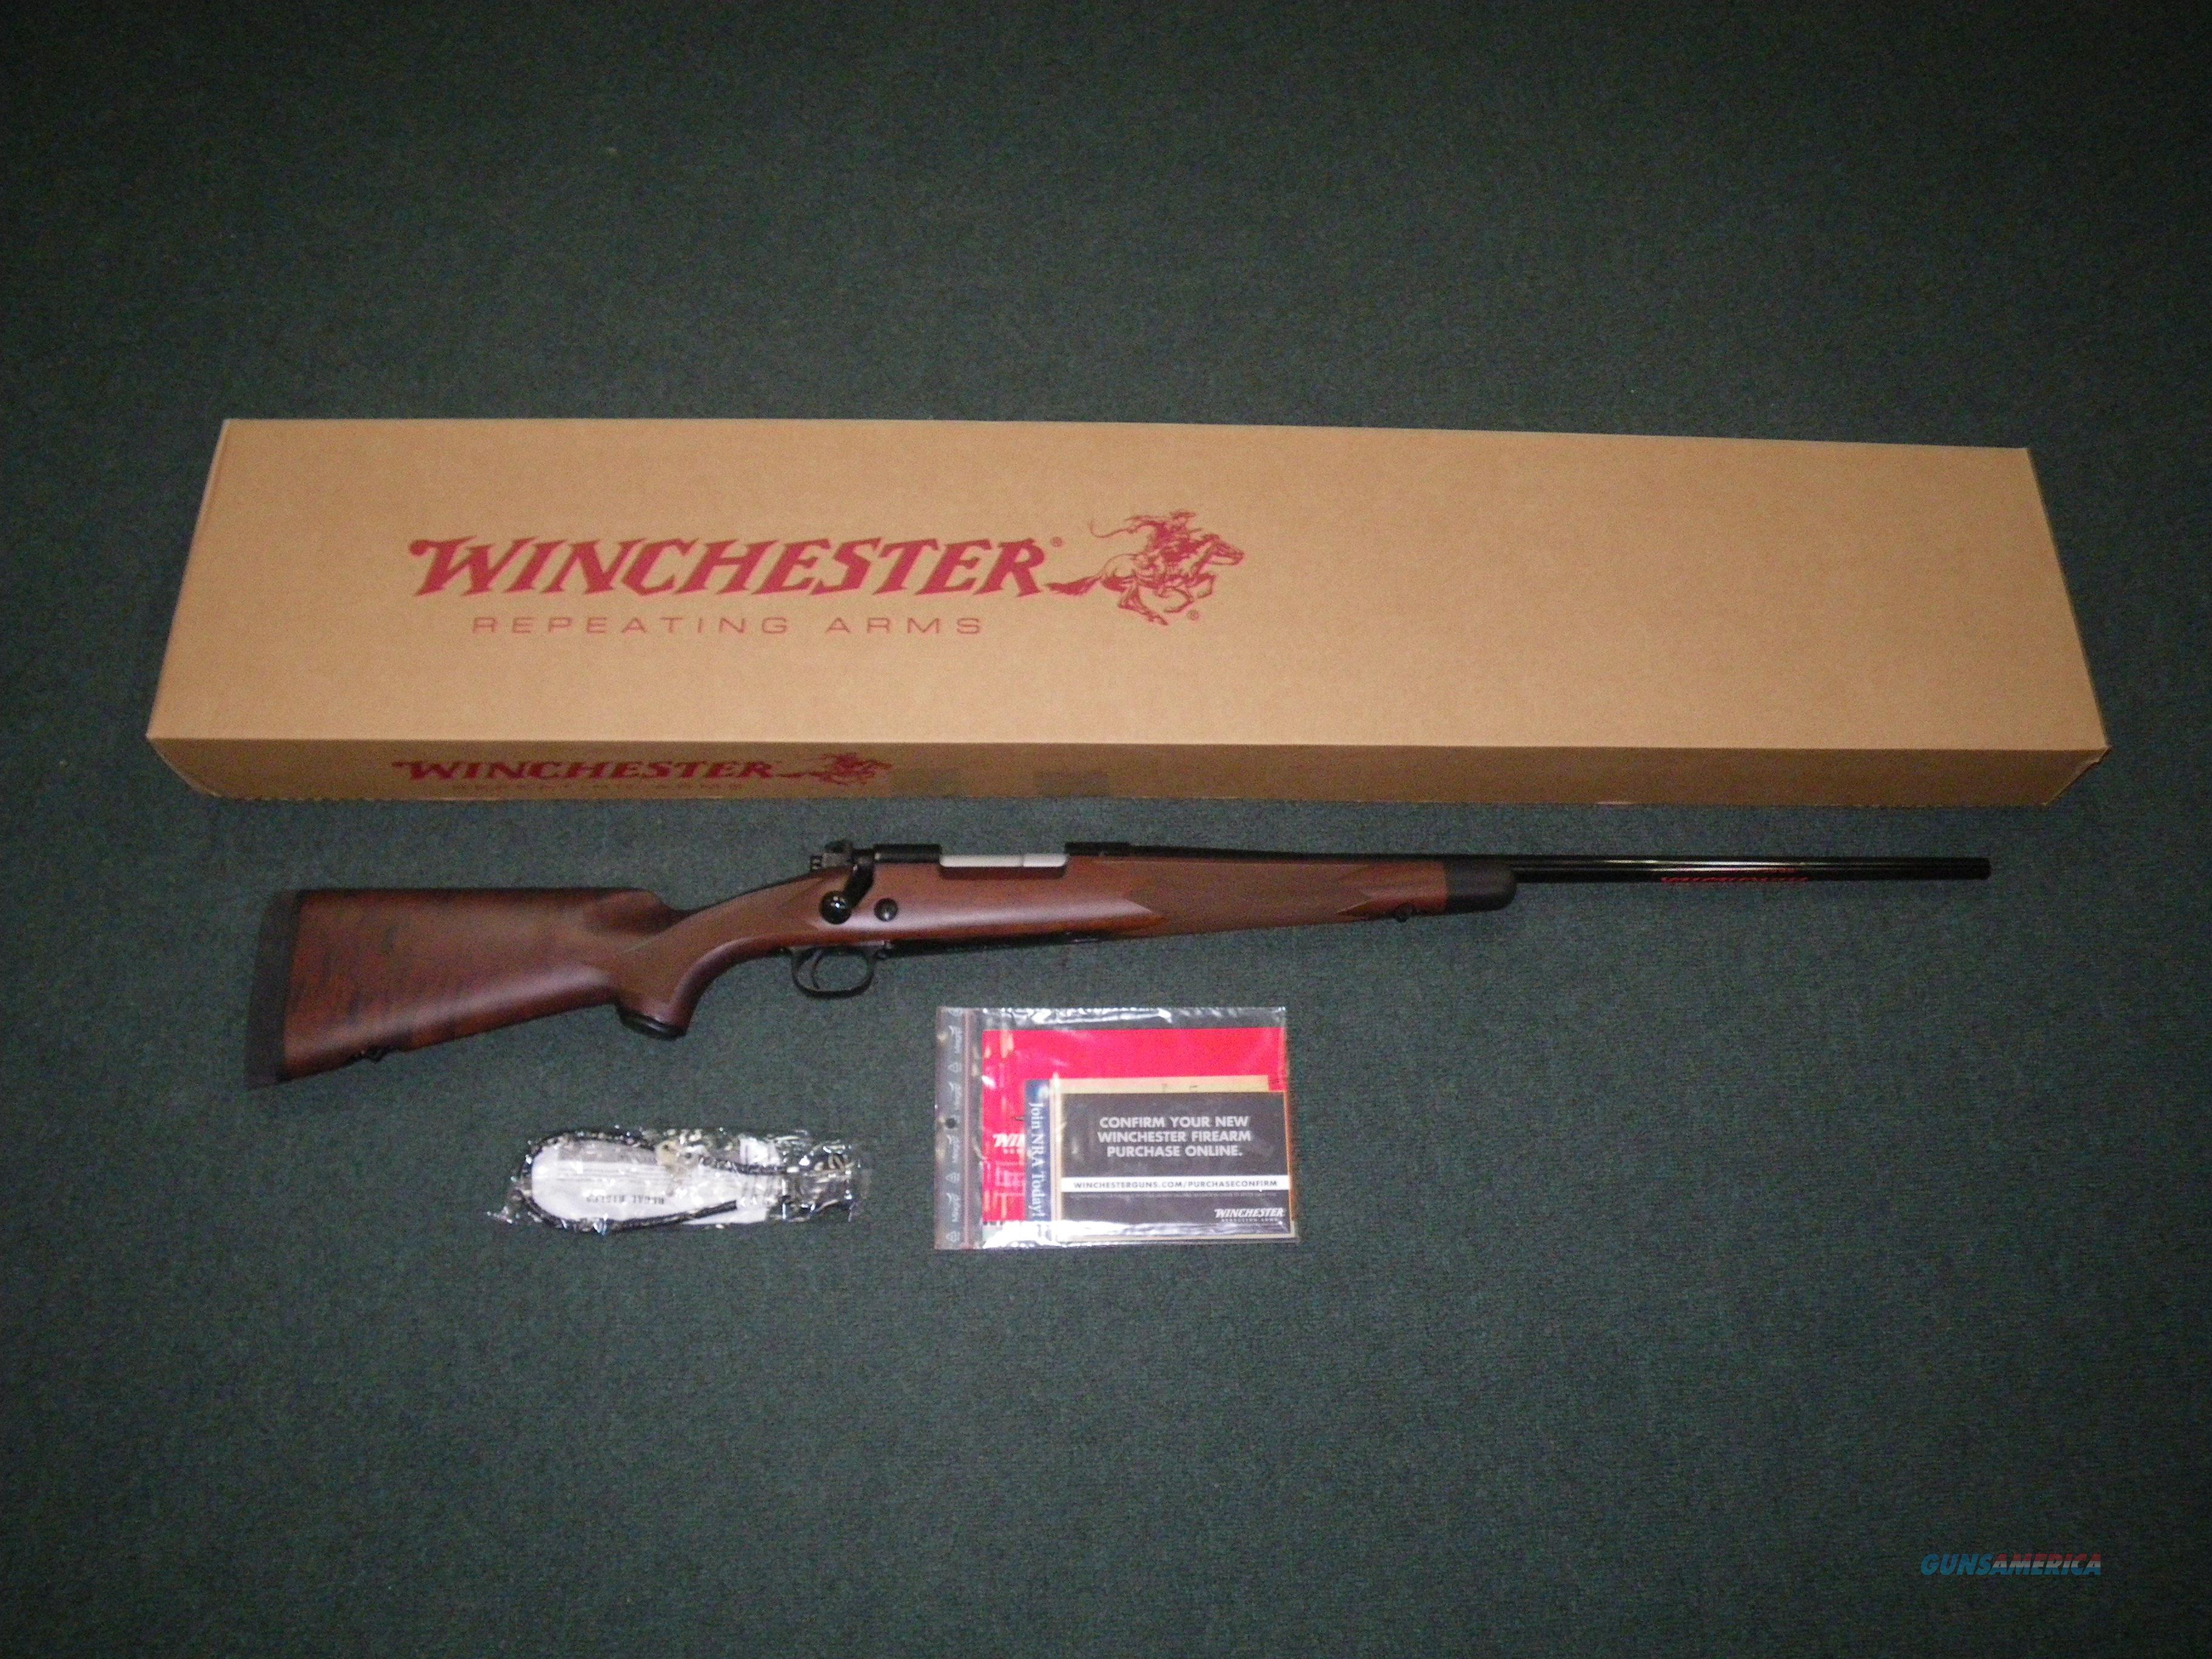 "Winchester Model 70 Super Grade 30-06 Spfld 24"" NEW #535203228  Guns > Rifles > Winchester Rifles - Modern Bolt/Auto/Single > Model 70 > Post-64"